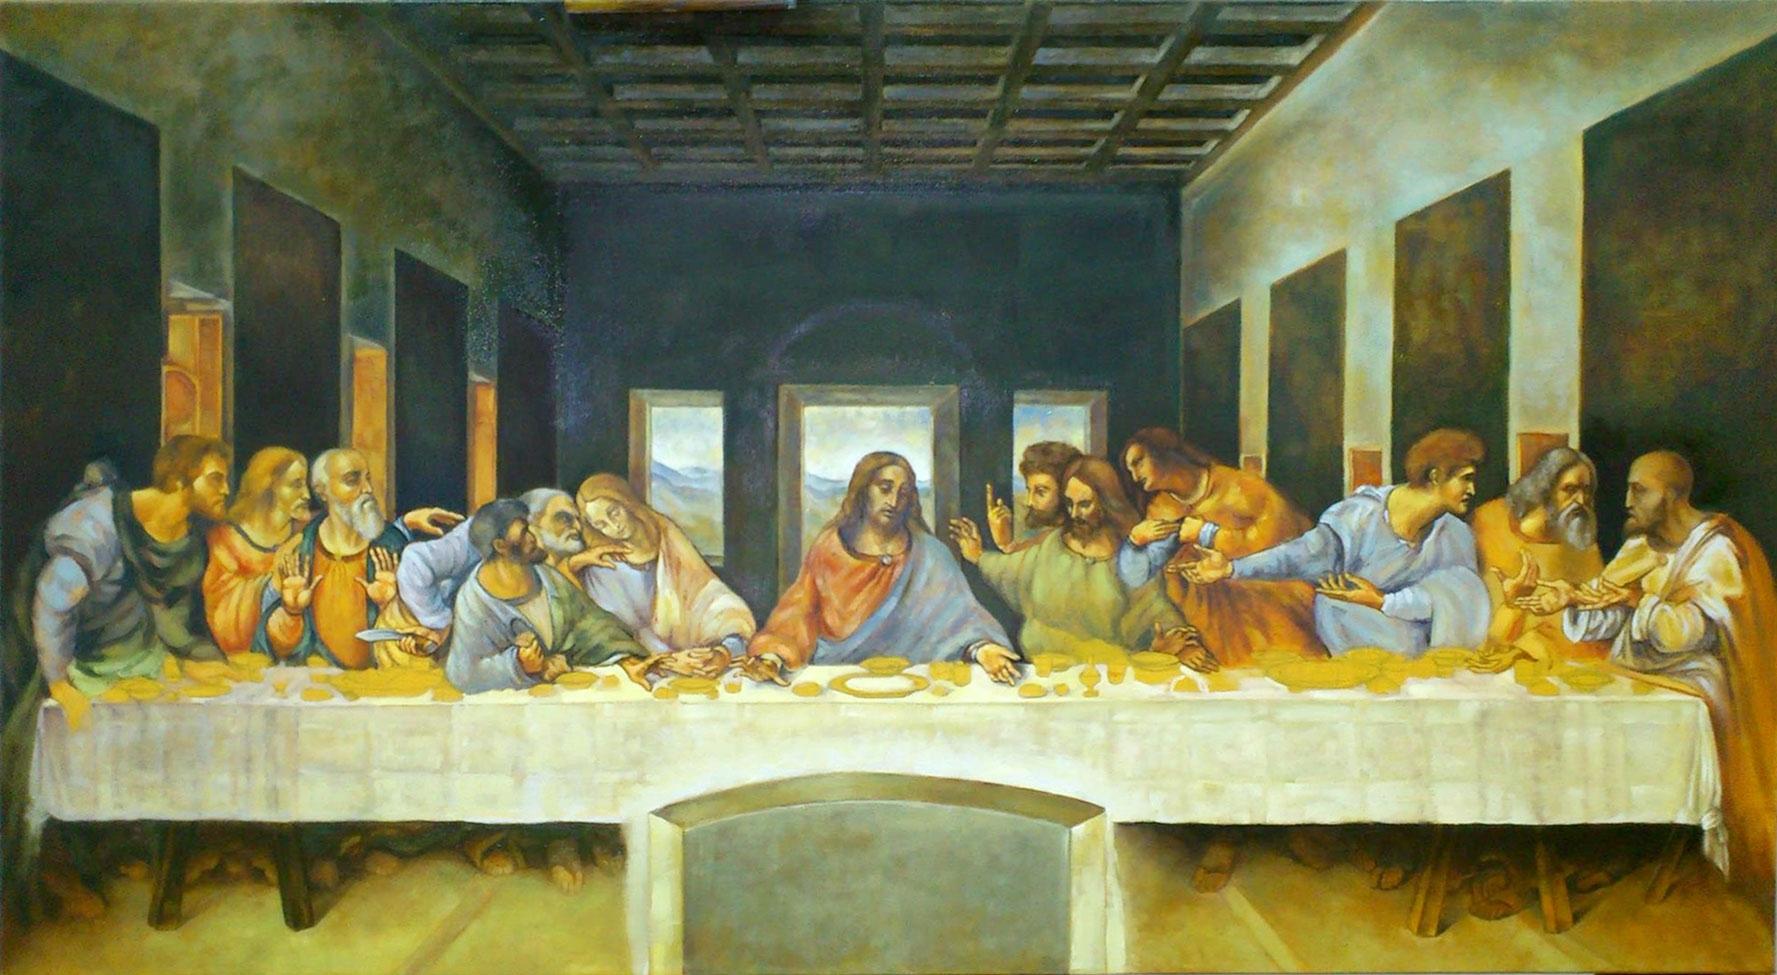 fine art - last supper - original oil painting on canvasartist